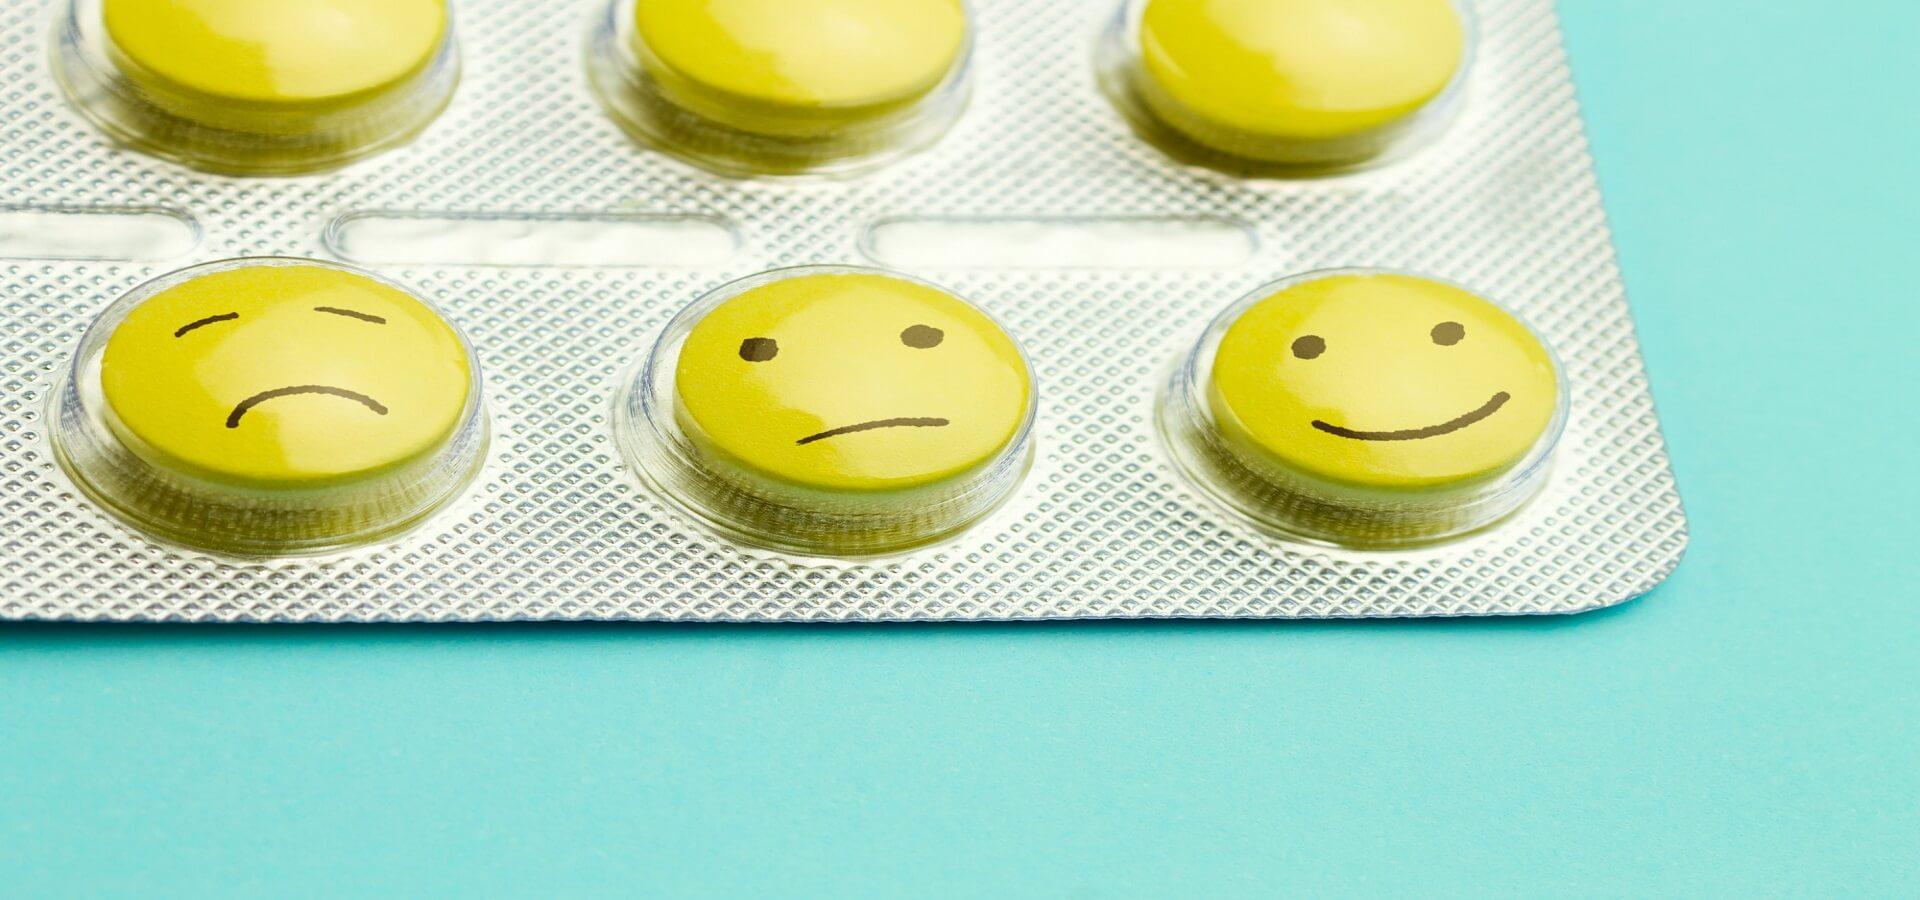 antidepressant ضدافسردگی